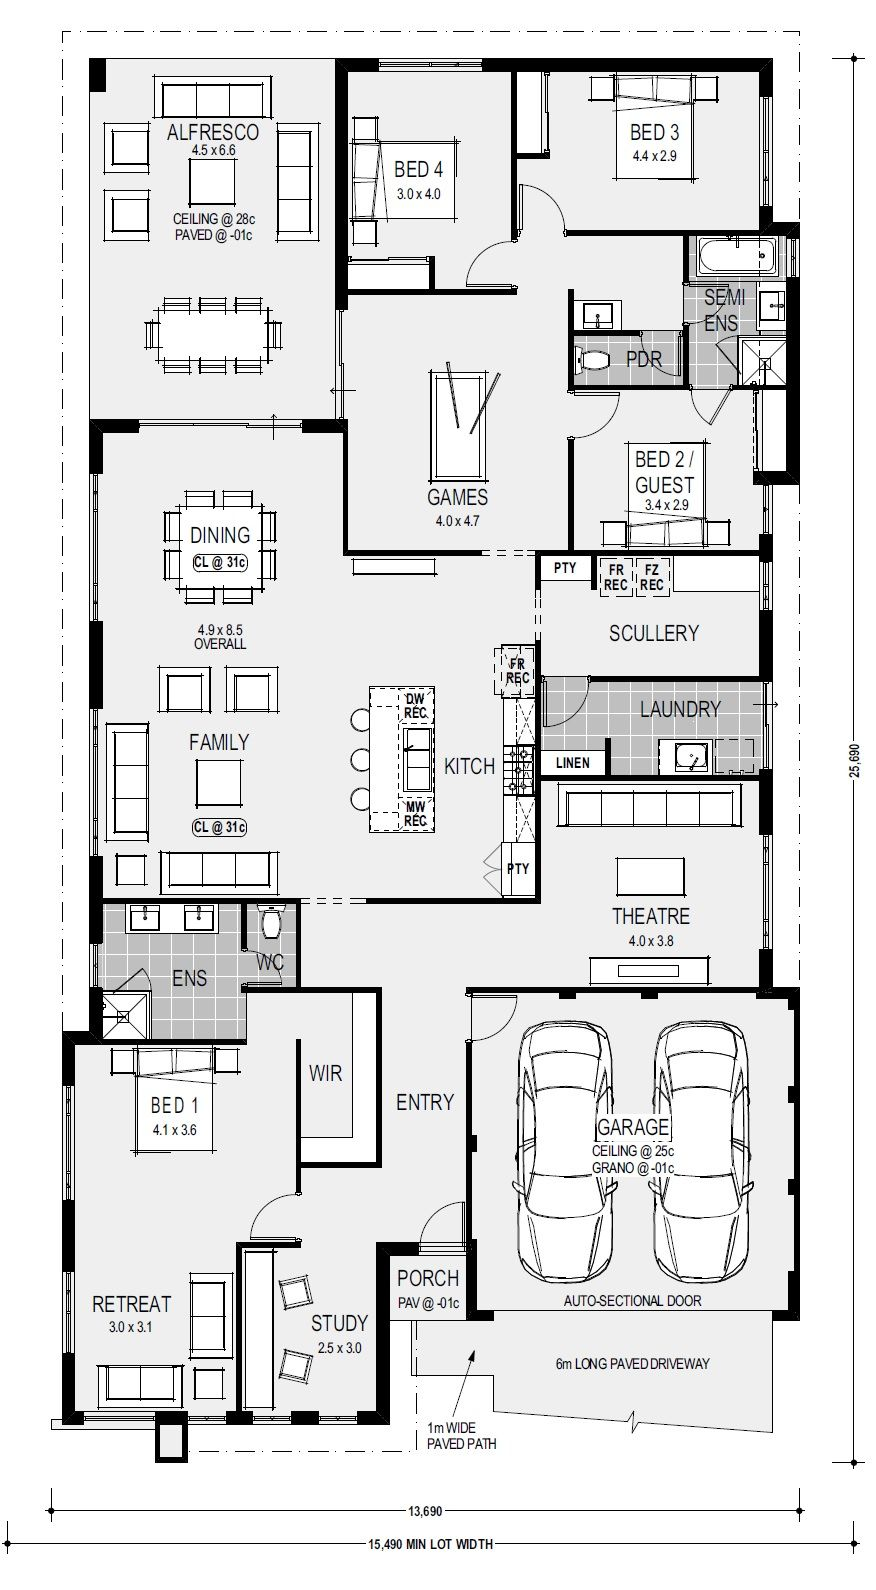 Floor Plans Of Indiana Designer Kitchen By Home Group Wa Floor Plans House Plans House Floor Plans